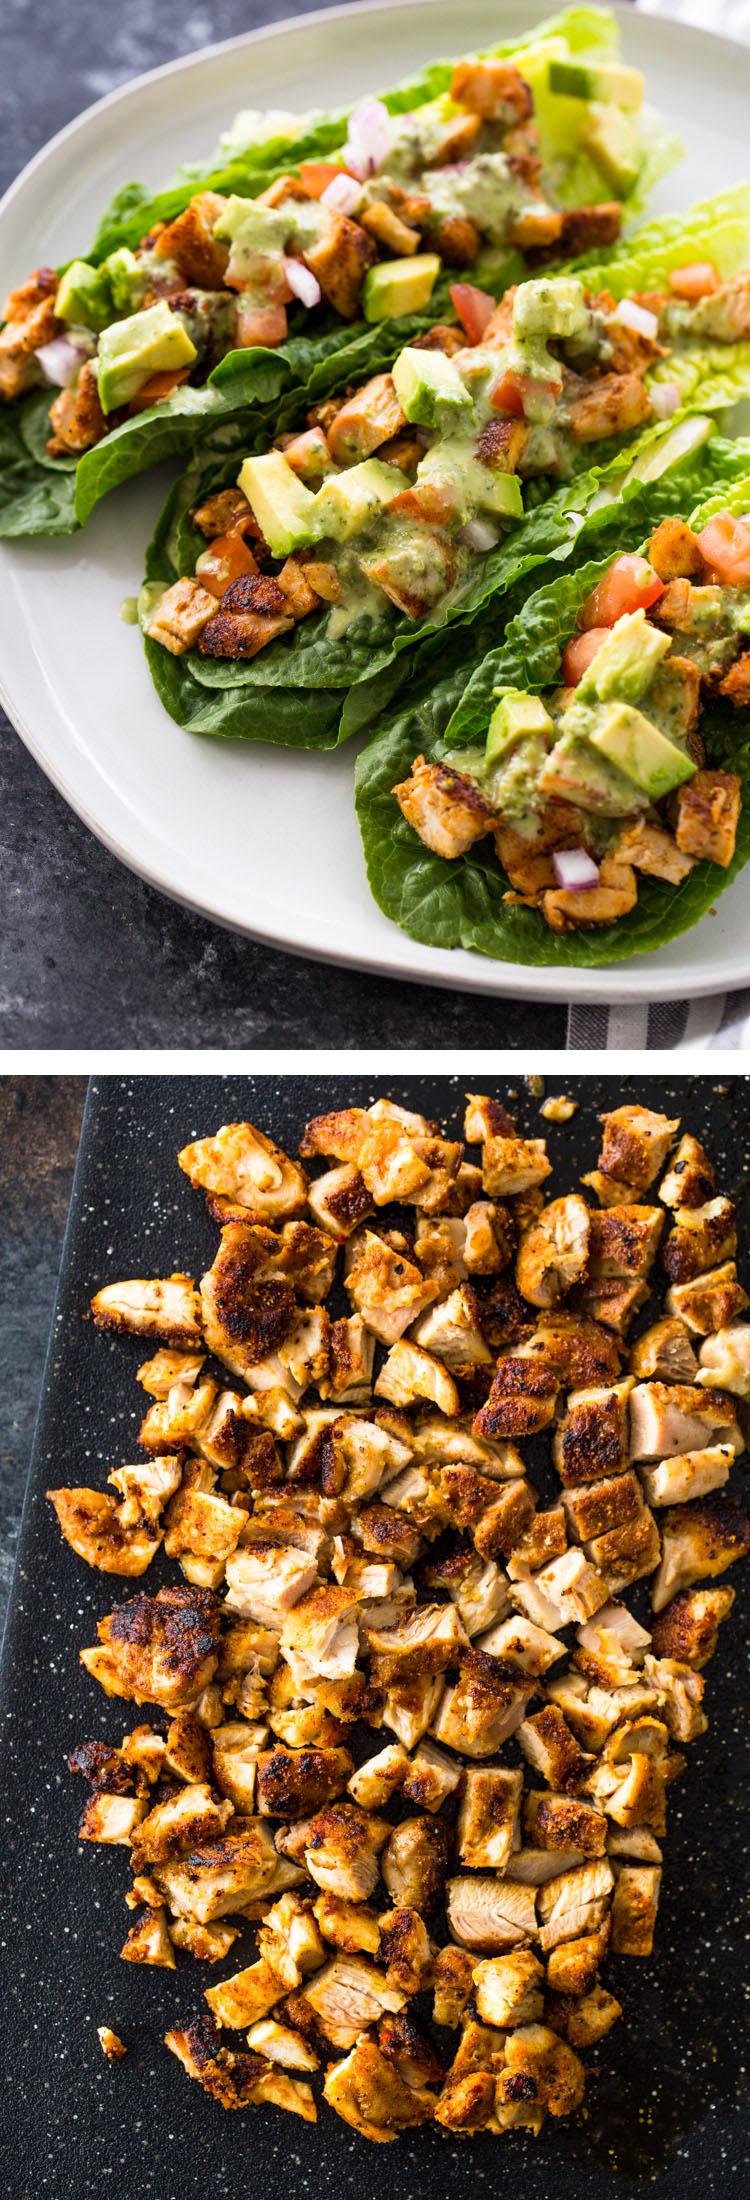 Chicken Taco Lettuce Wraps (Low-Carb , Paleo, Keto)